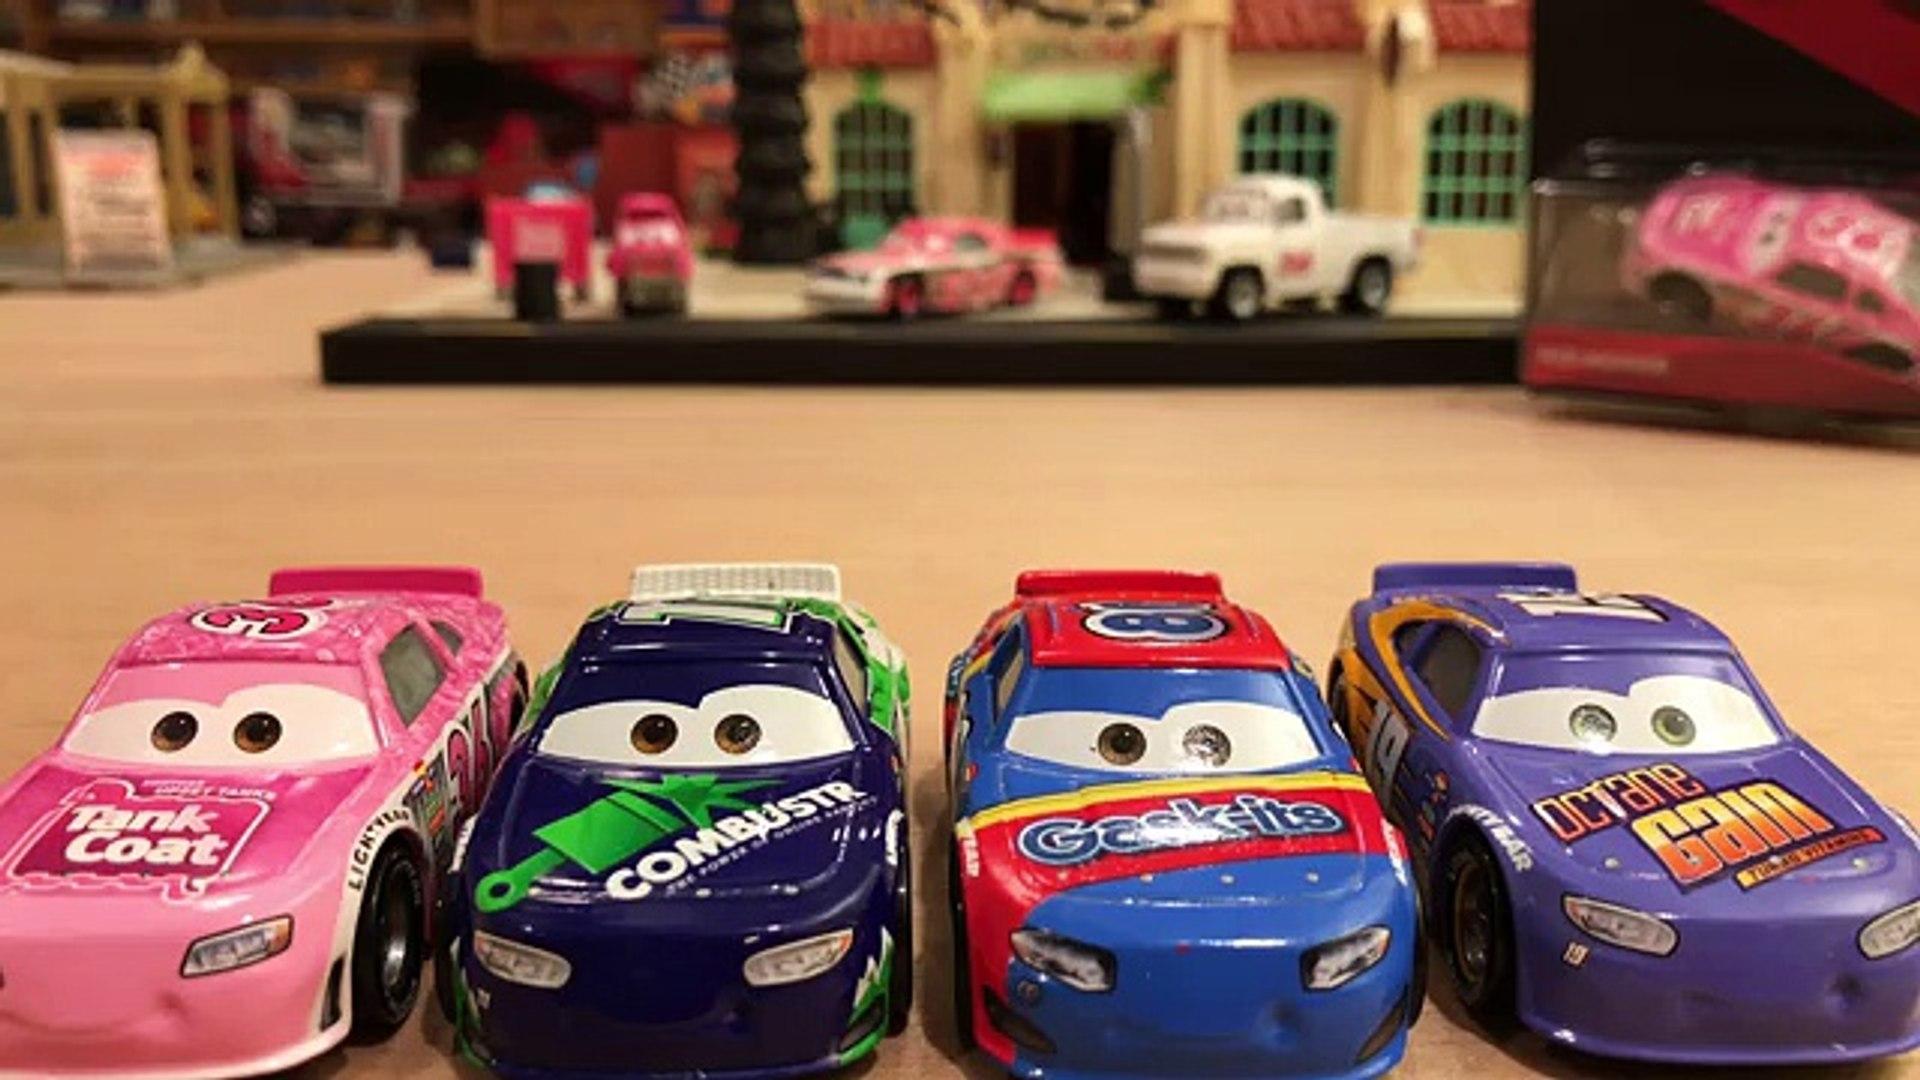 CRUZ RAMIREZ NEW DISNEY CARS REV N RACE LIGHTING MC QUEEN DANNY SWERVEZ TOYS